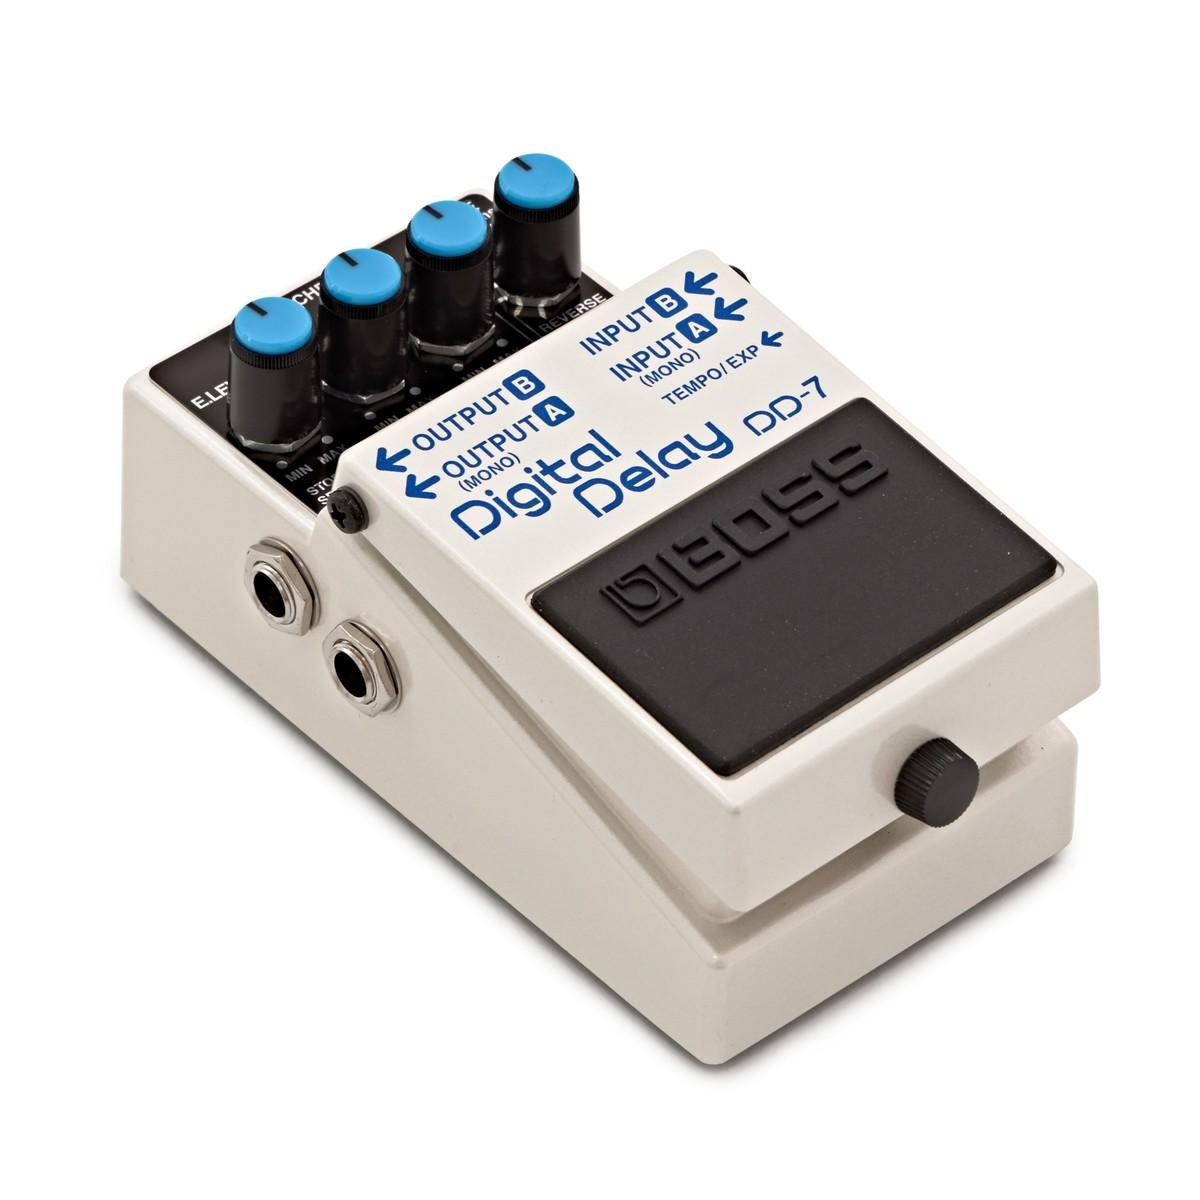 boss dd 7 digital delay effects pedal at gear4music. Black Bedroom Furniture Sets. Home Design Ideas